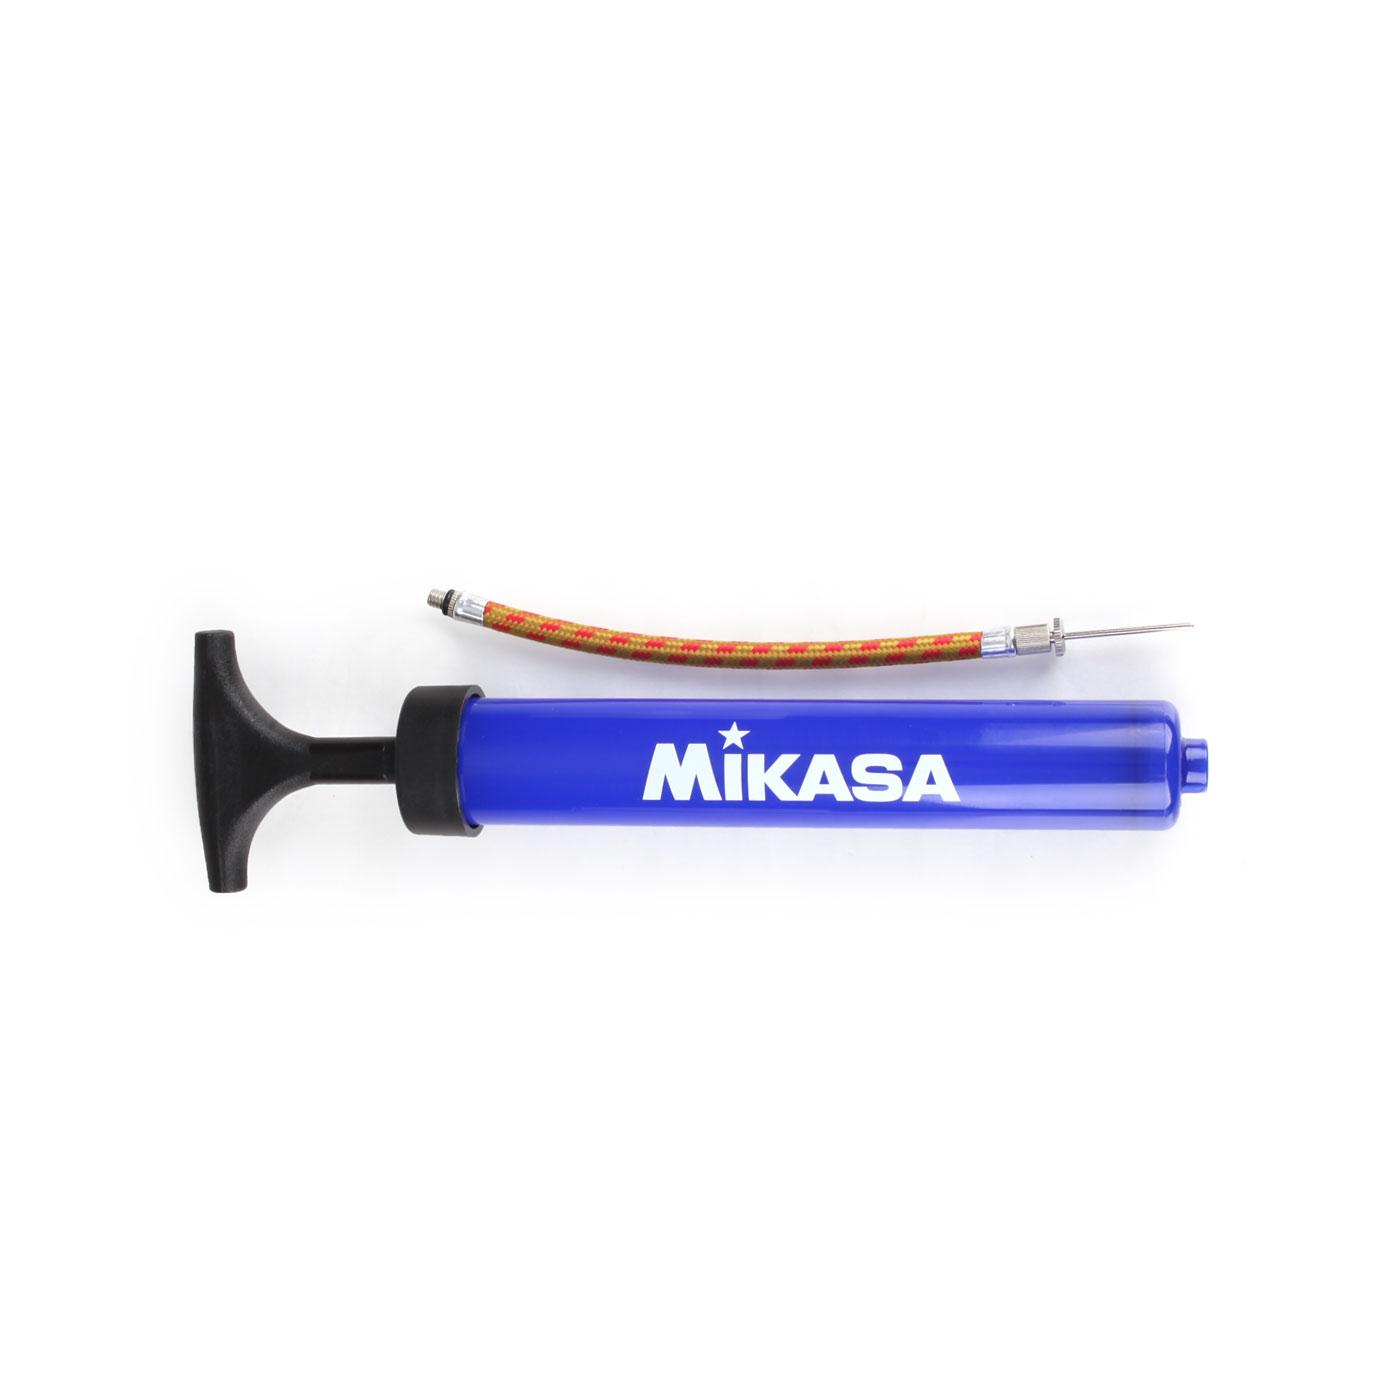 MIKASA 打氣筒 MKPA22